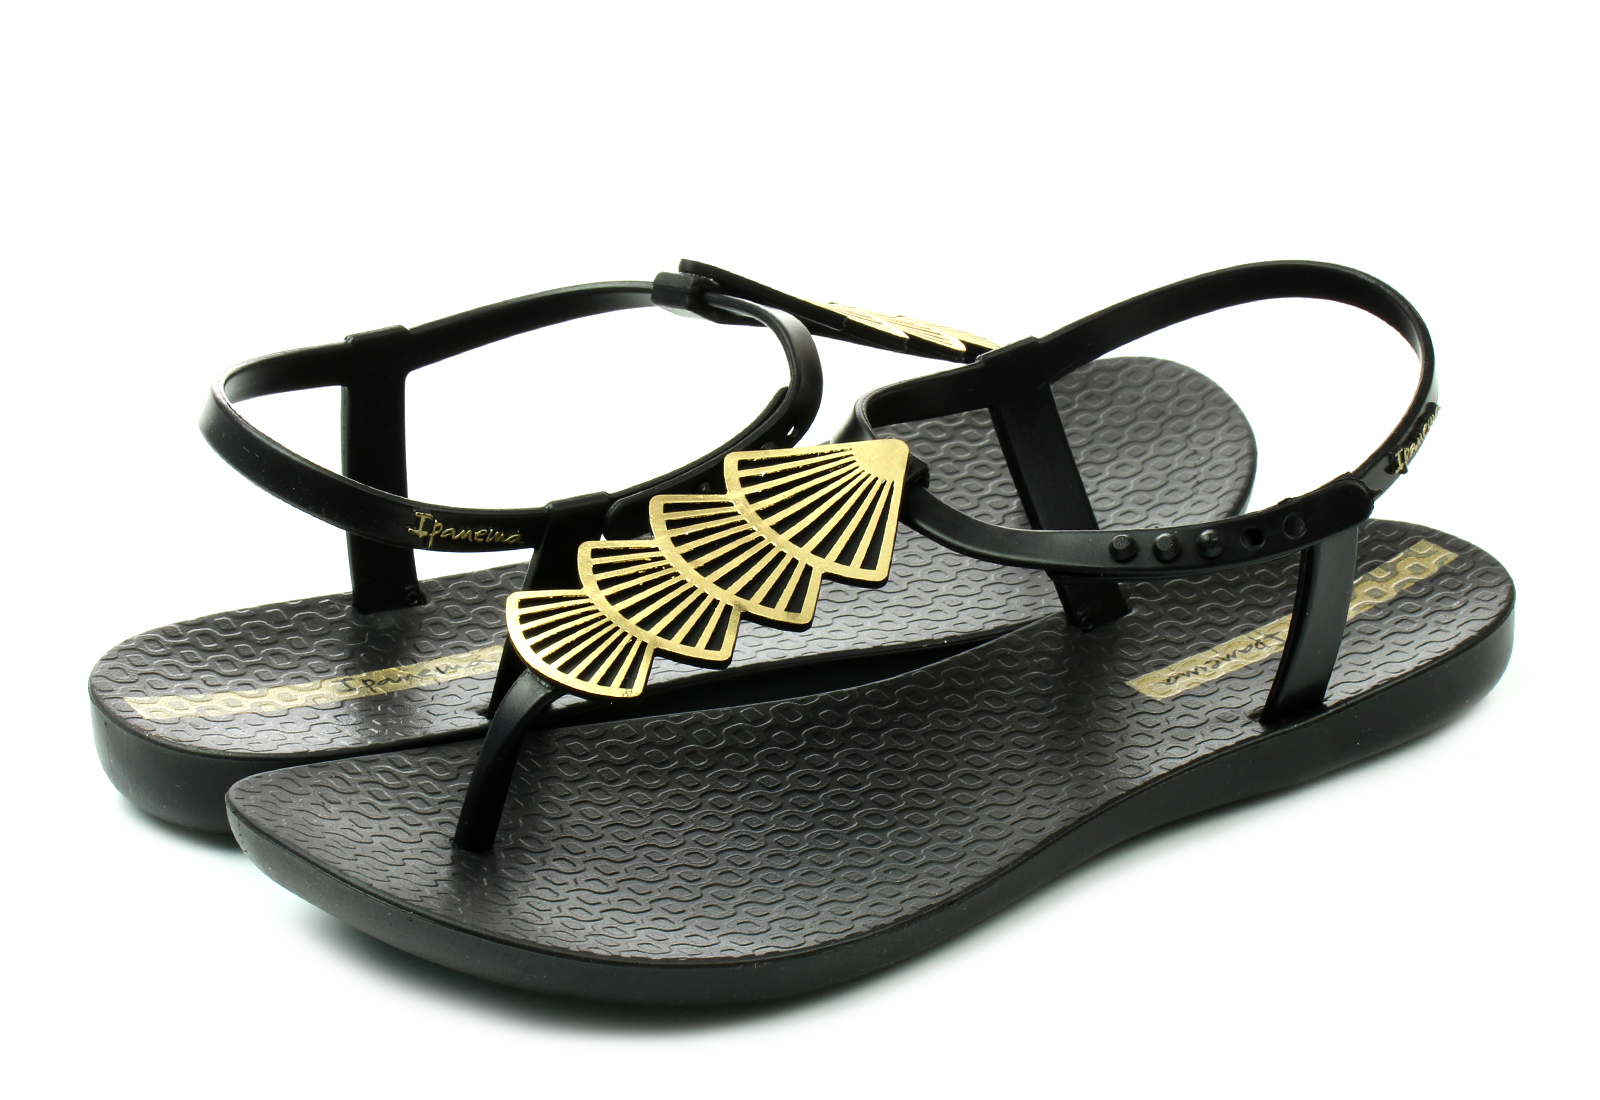 d385b2c06a Ipanema Szandál - Class Glam Ii - 26207-20766 - Office Shoes ...